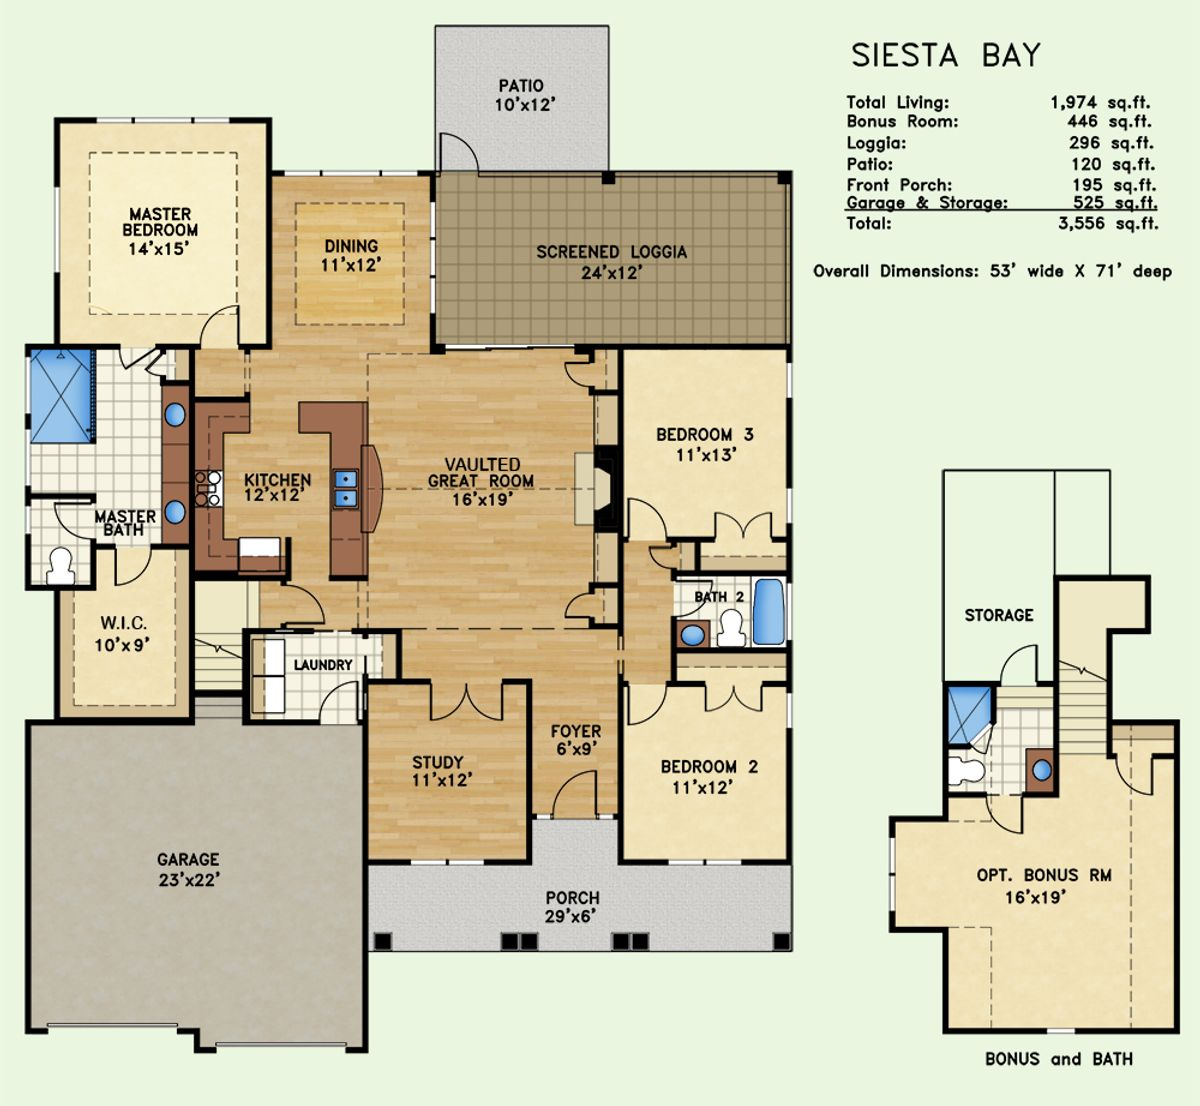 Siesta Bay Floor Plan